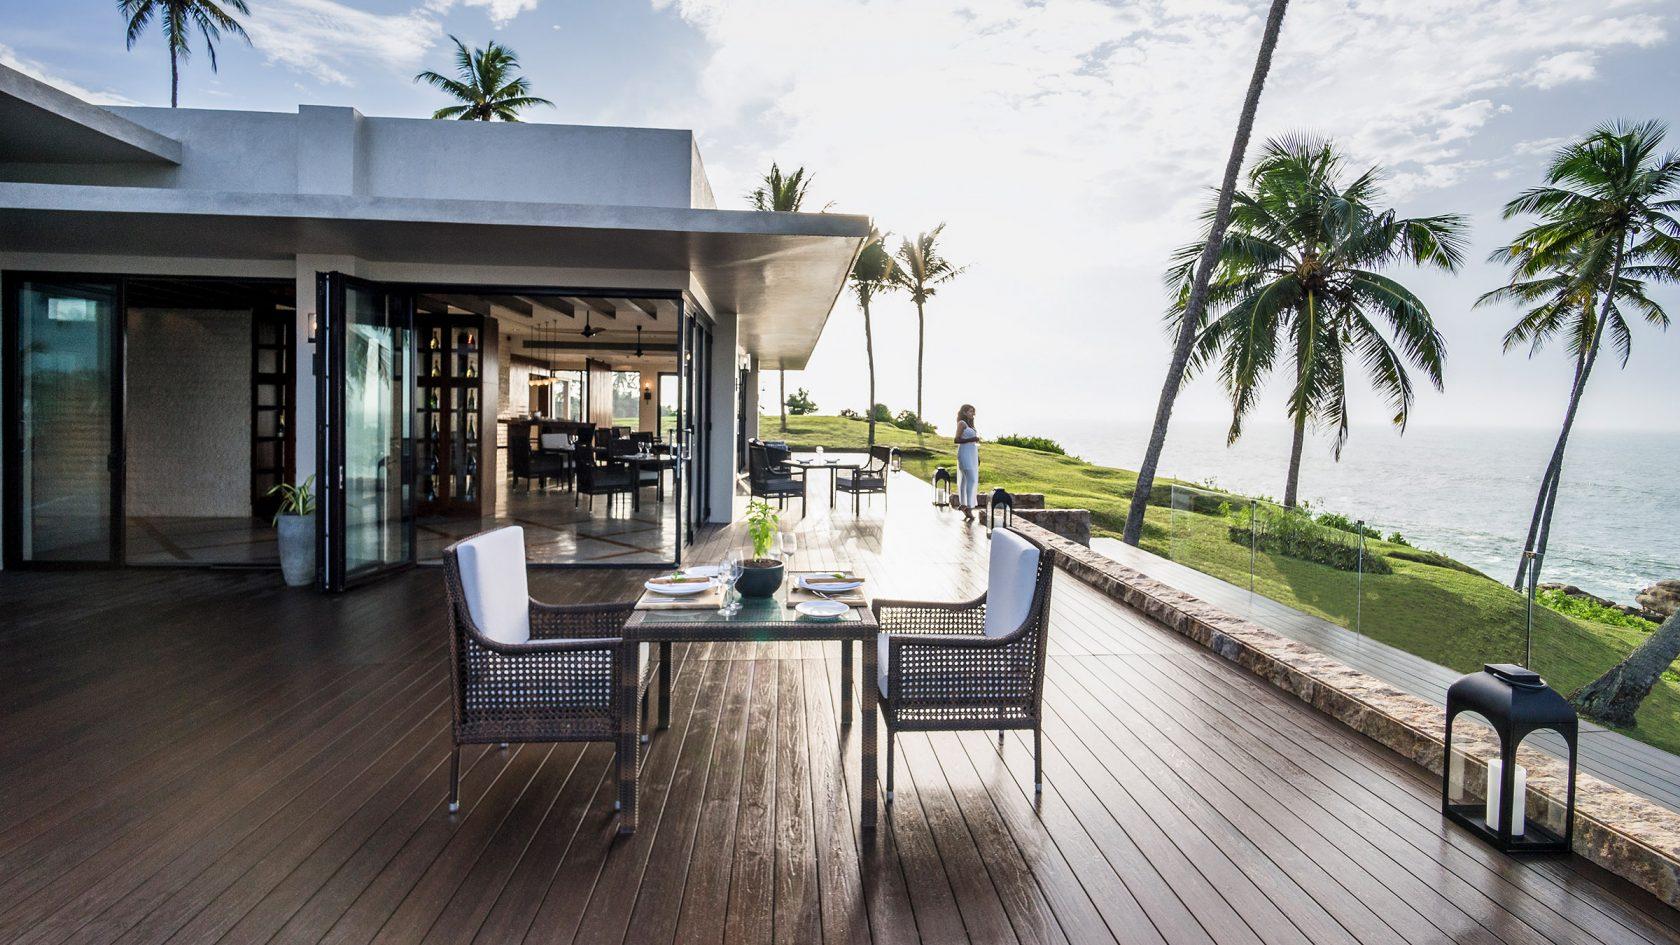 Anantara Tangalle, Sri Lanka